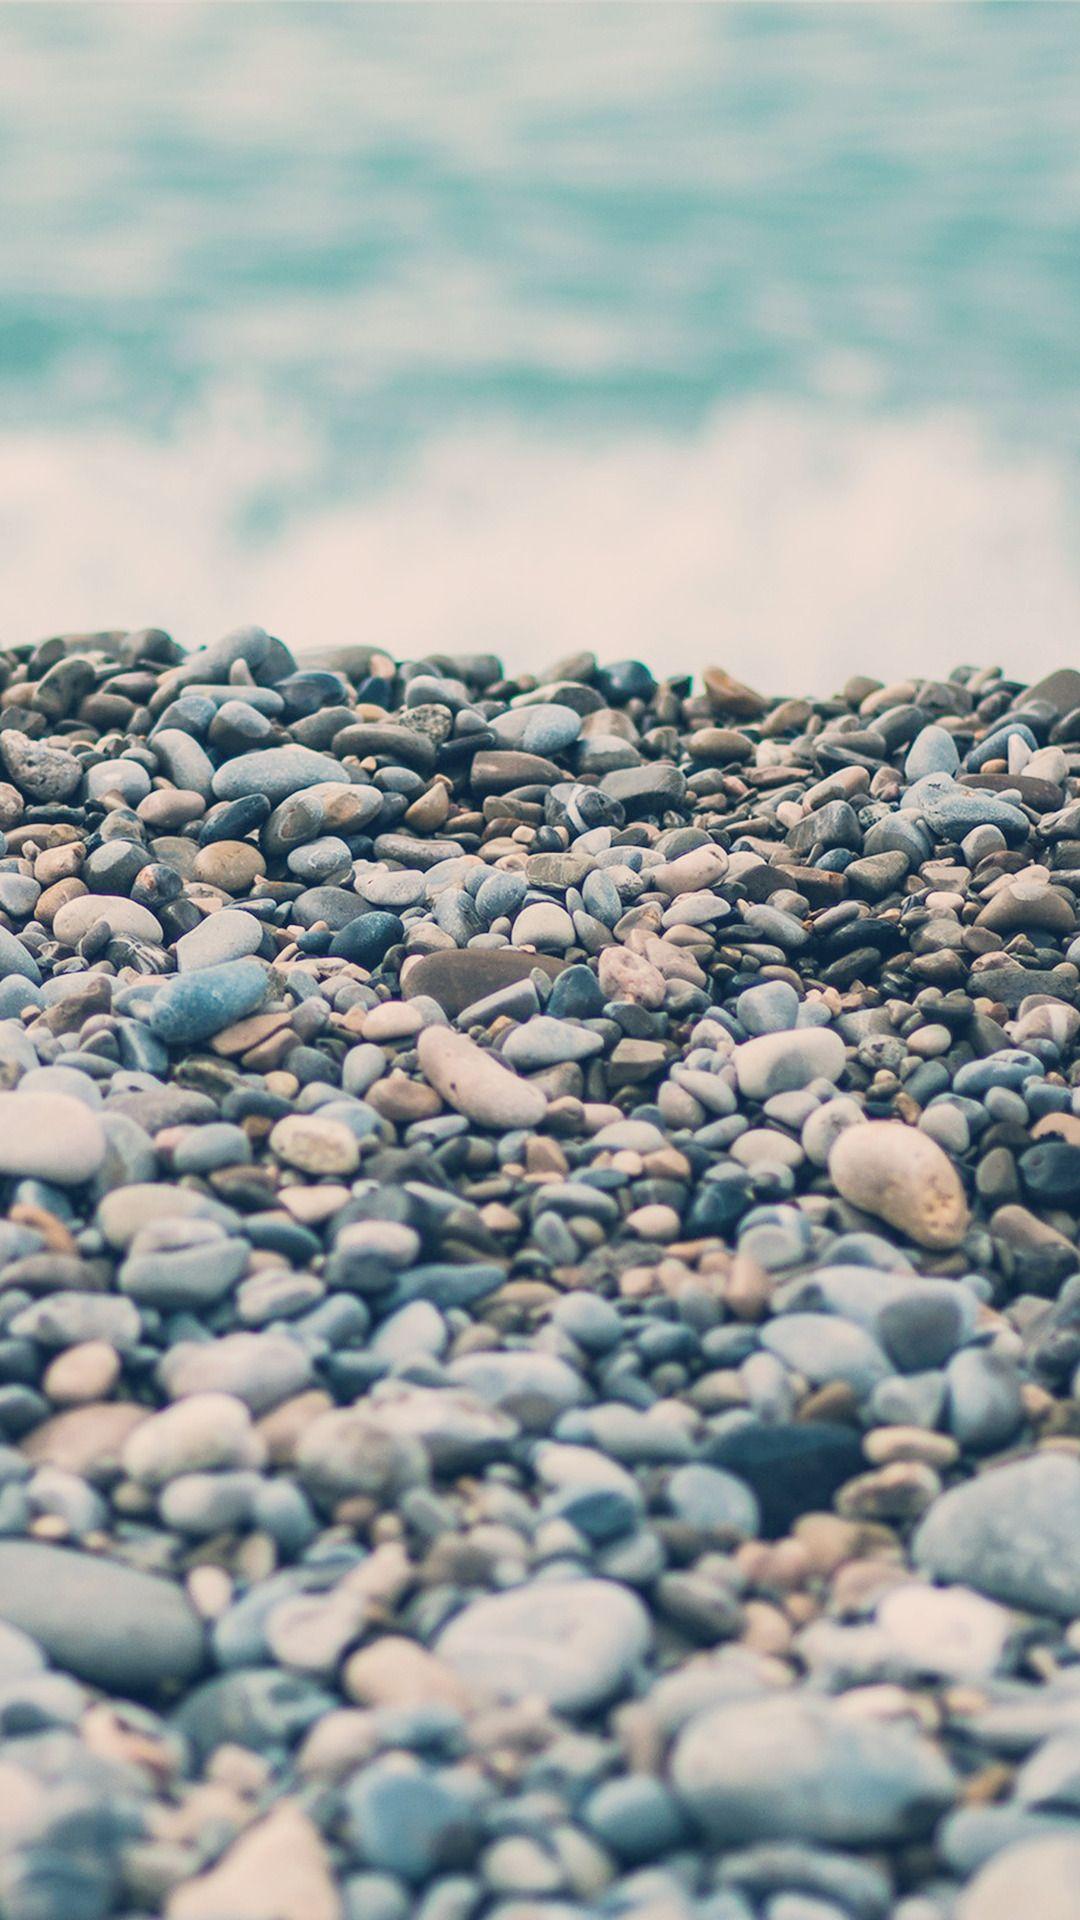 Iphone 6 Wallpaper Tumblr Beach